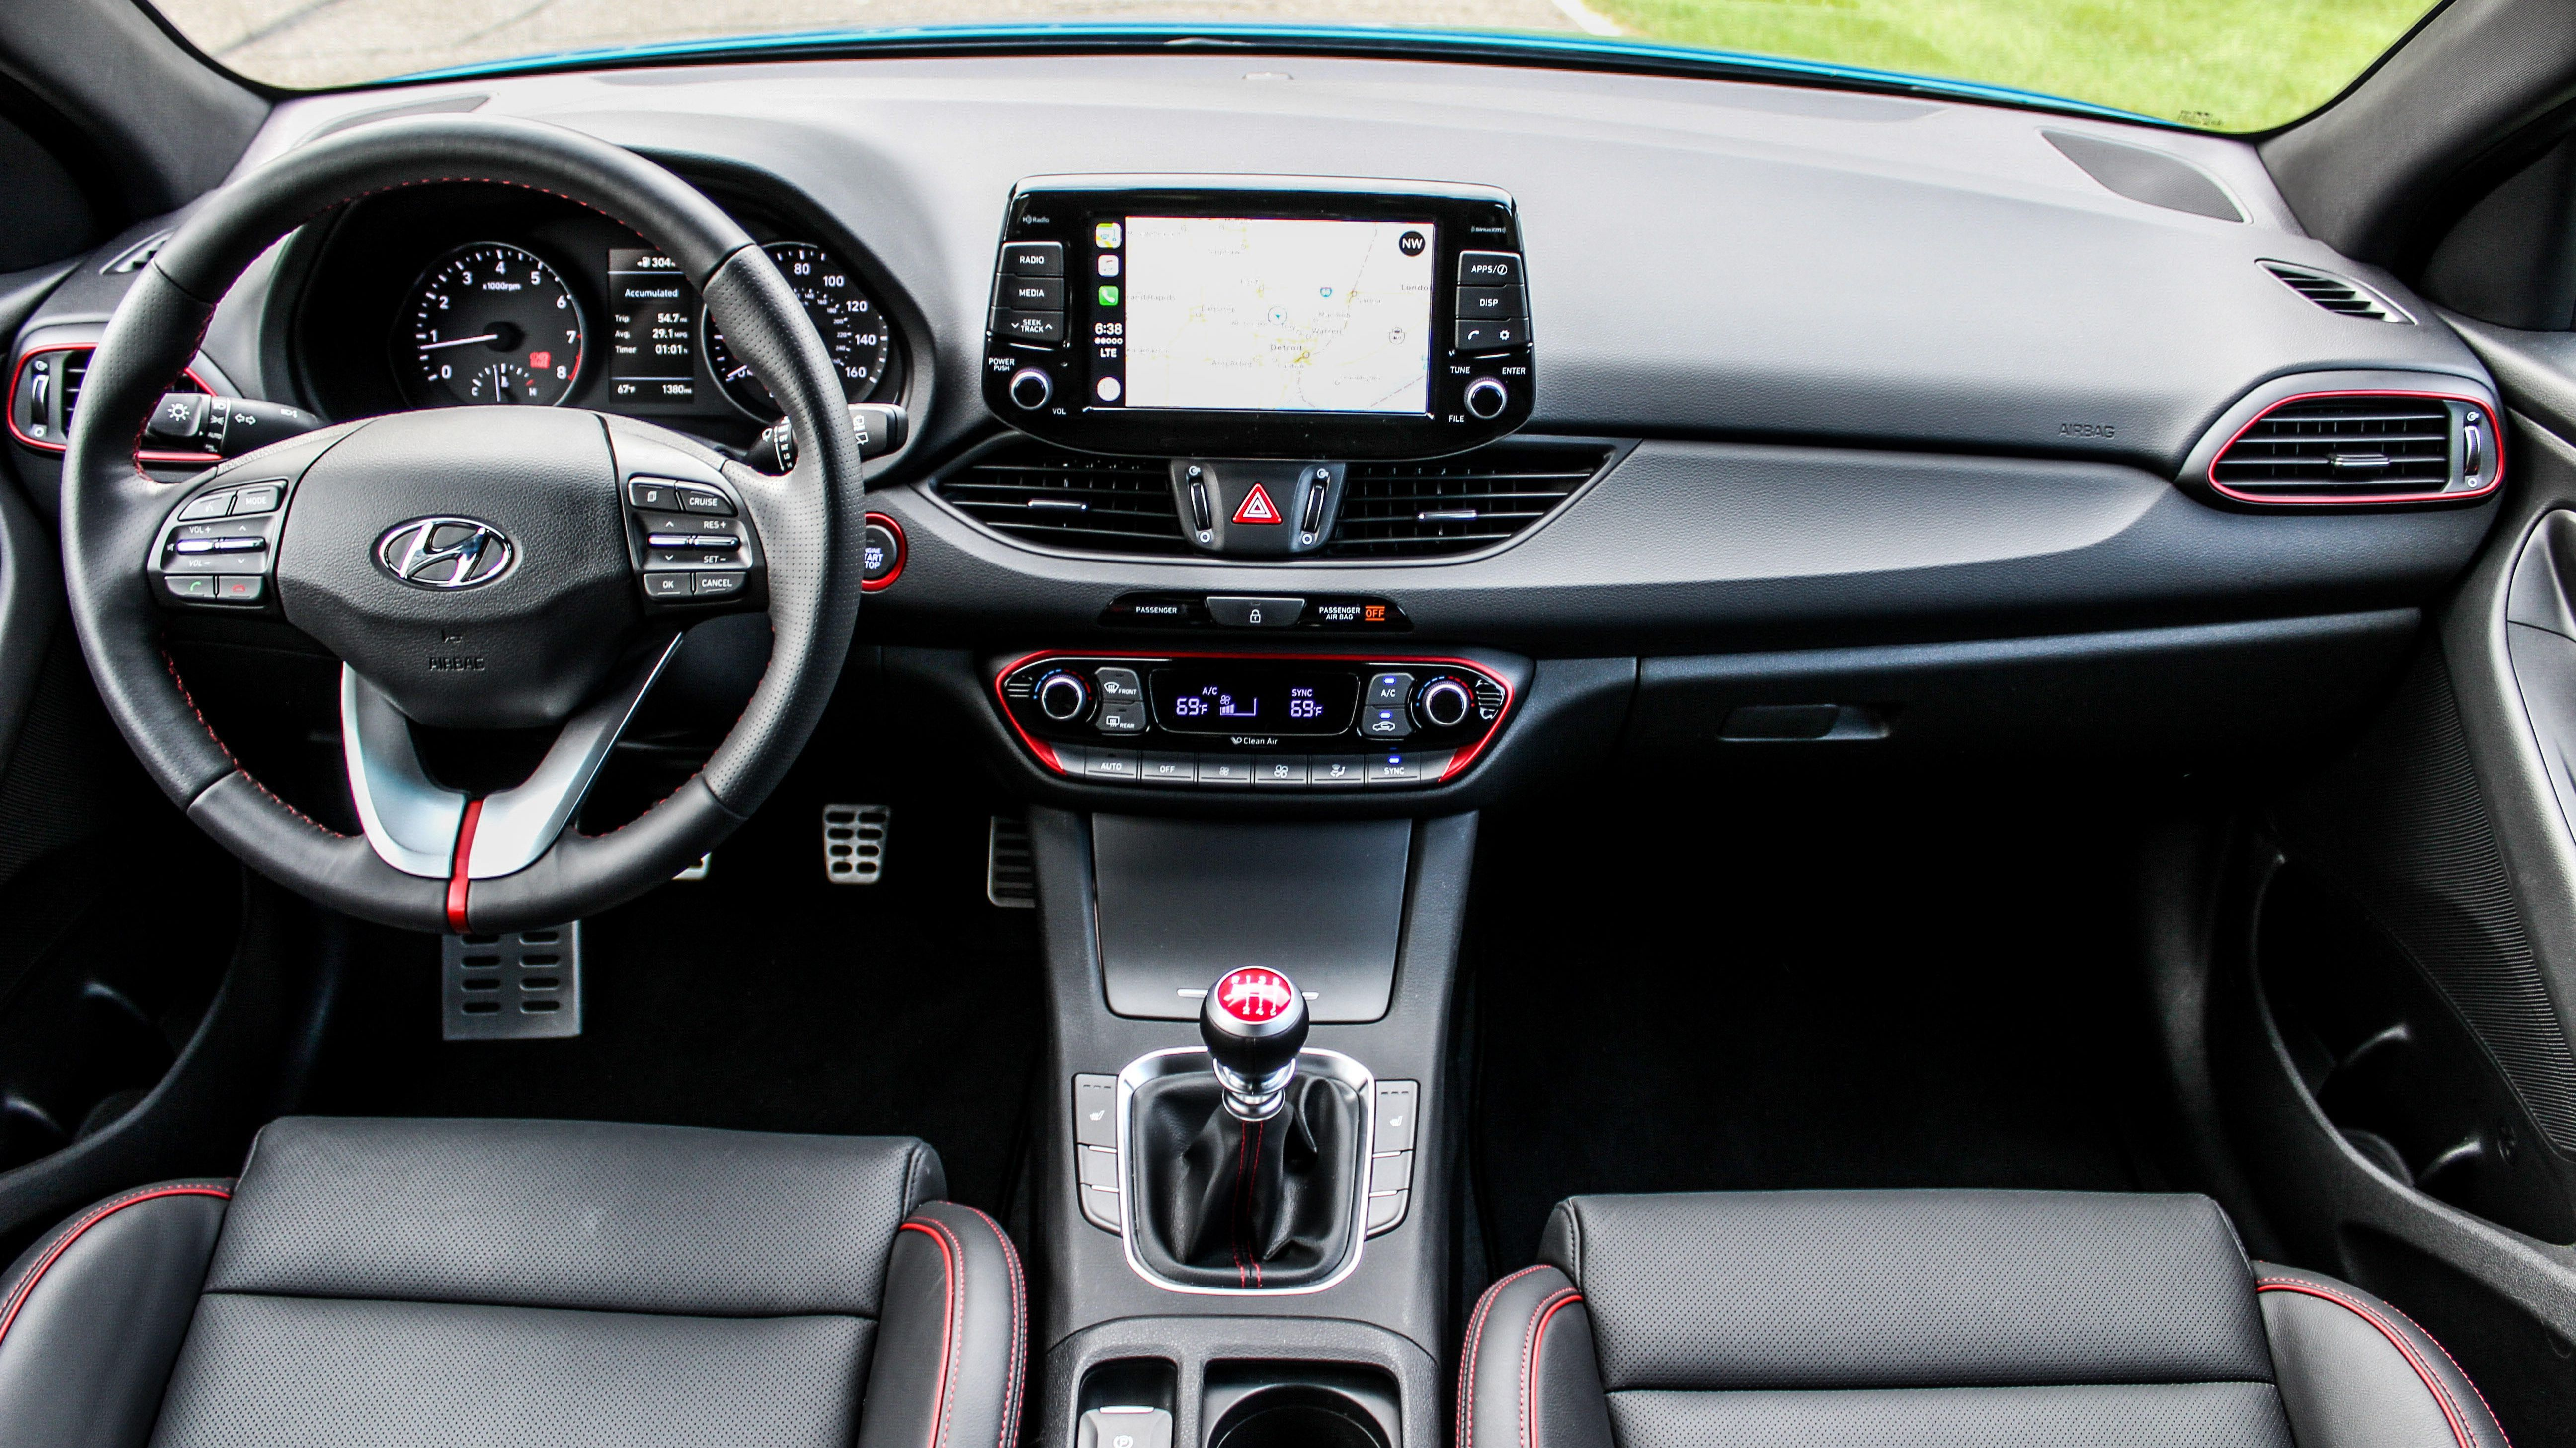 2018 Hyundai Elantra Gt Hot Ish Hatch Is Seriously Well Rounded Hyundai Elantra Elantra All Sports Cars